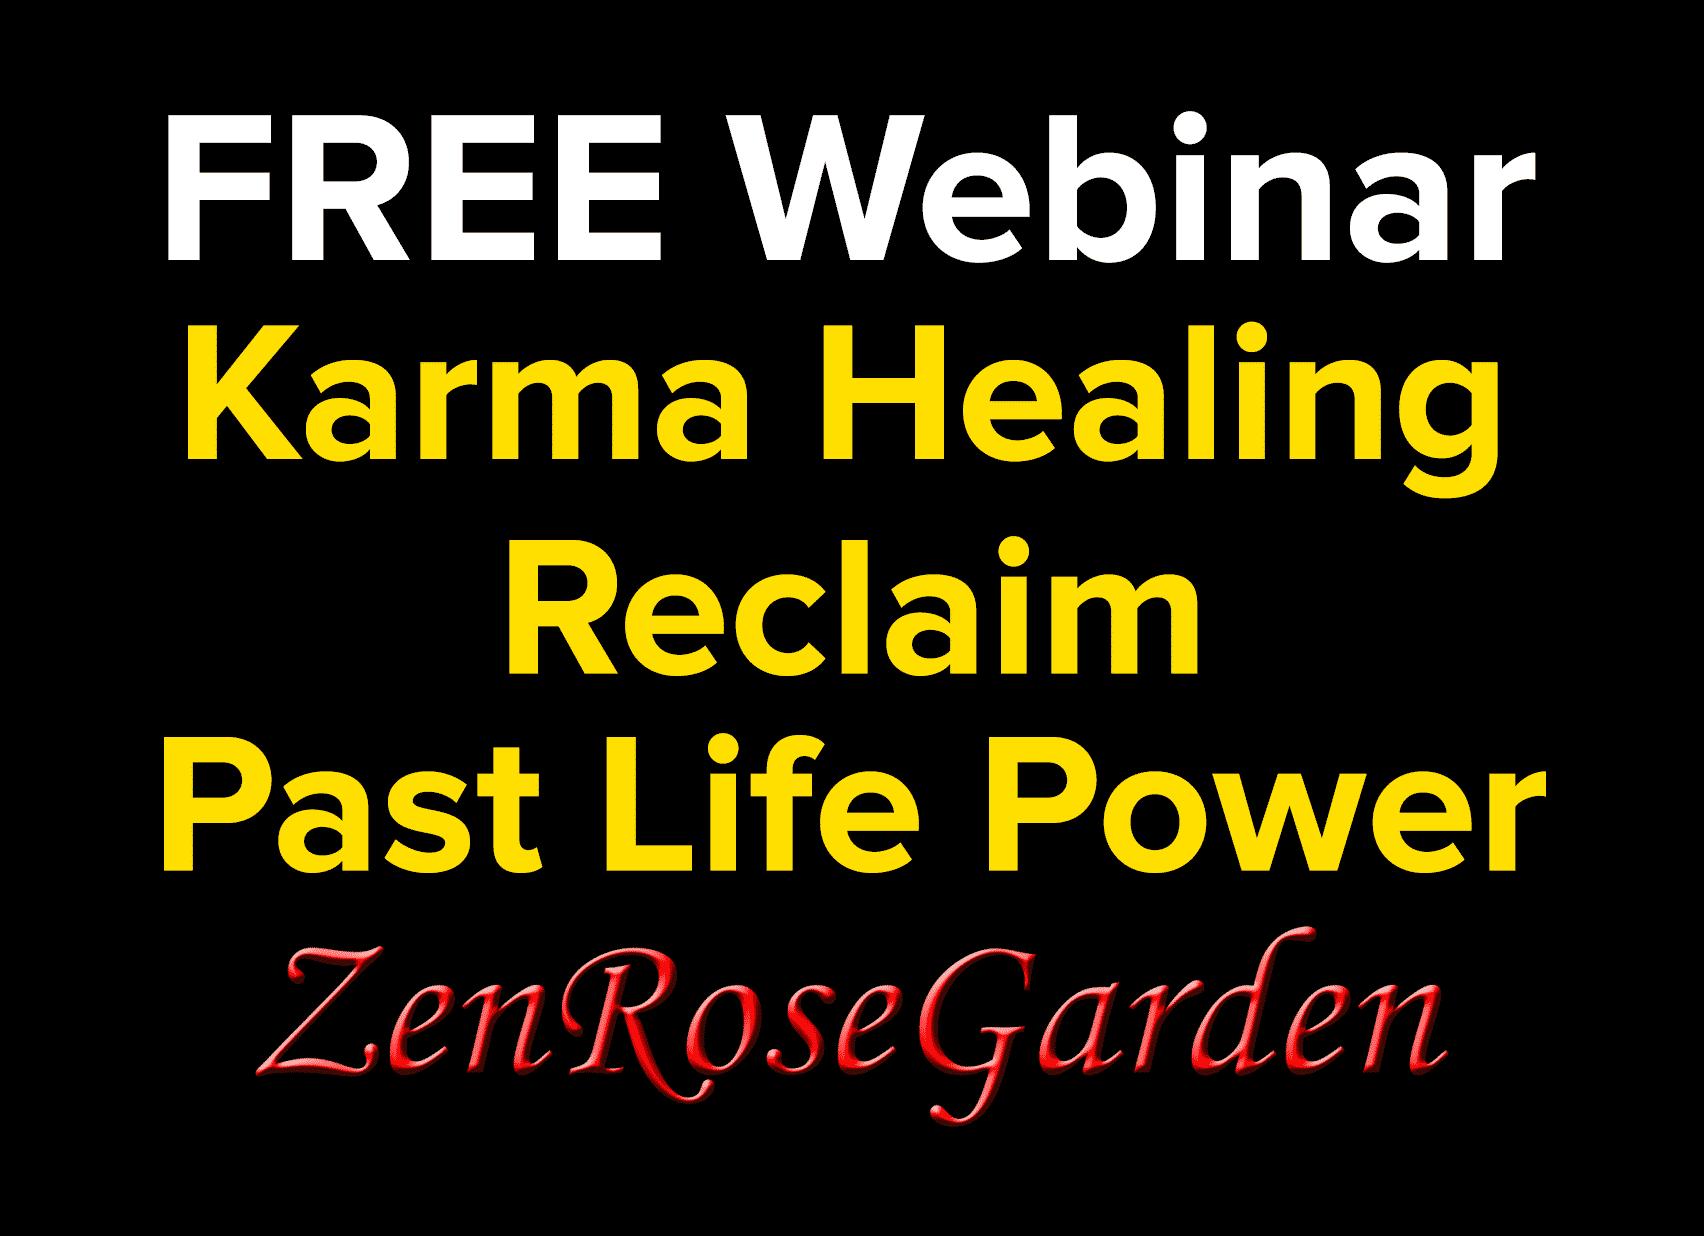 Karma Healing Reclaim Past Life Power